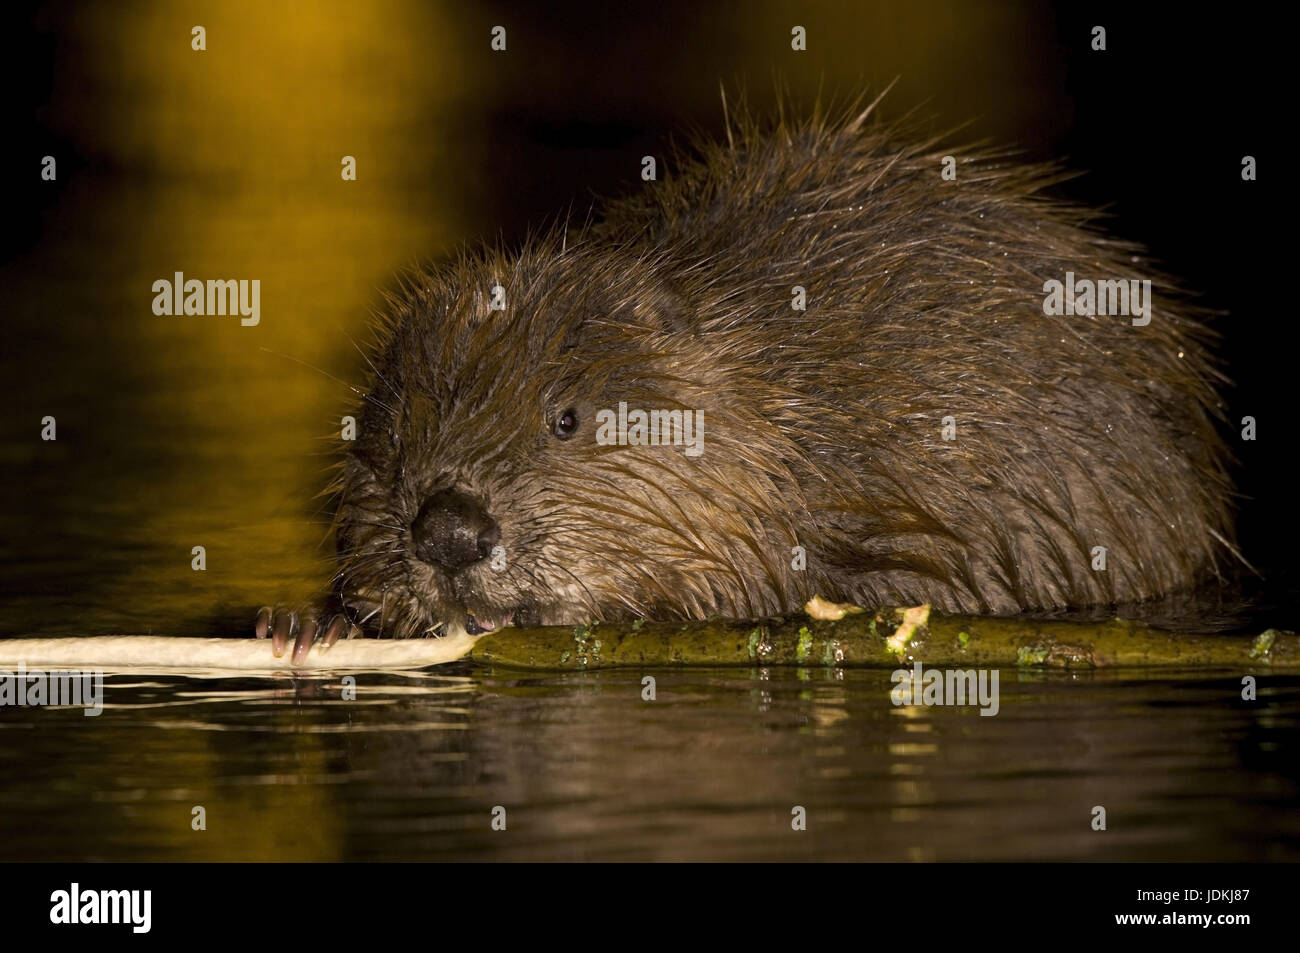 Beavers, Castoridae, rodents, Rodentia, mammals Stock Photo